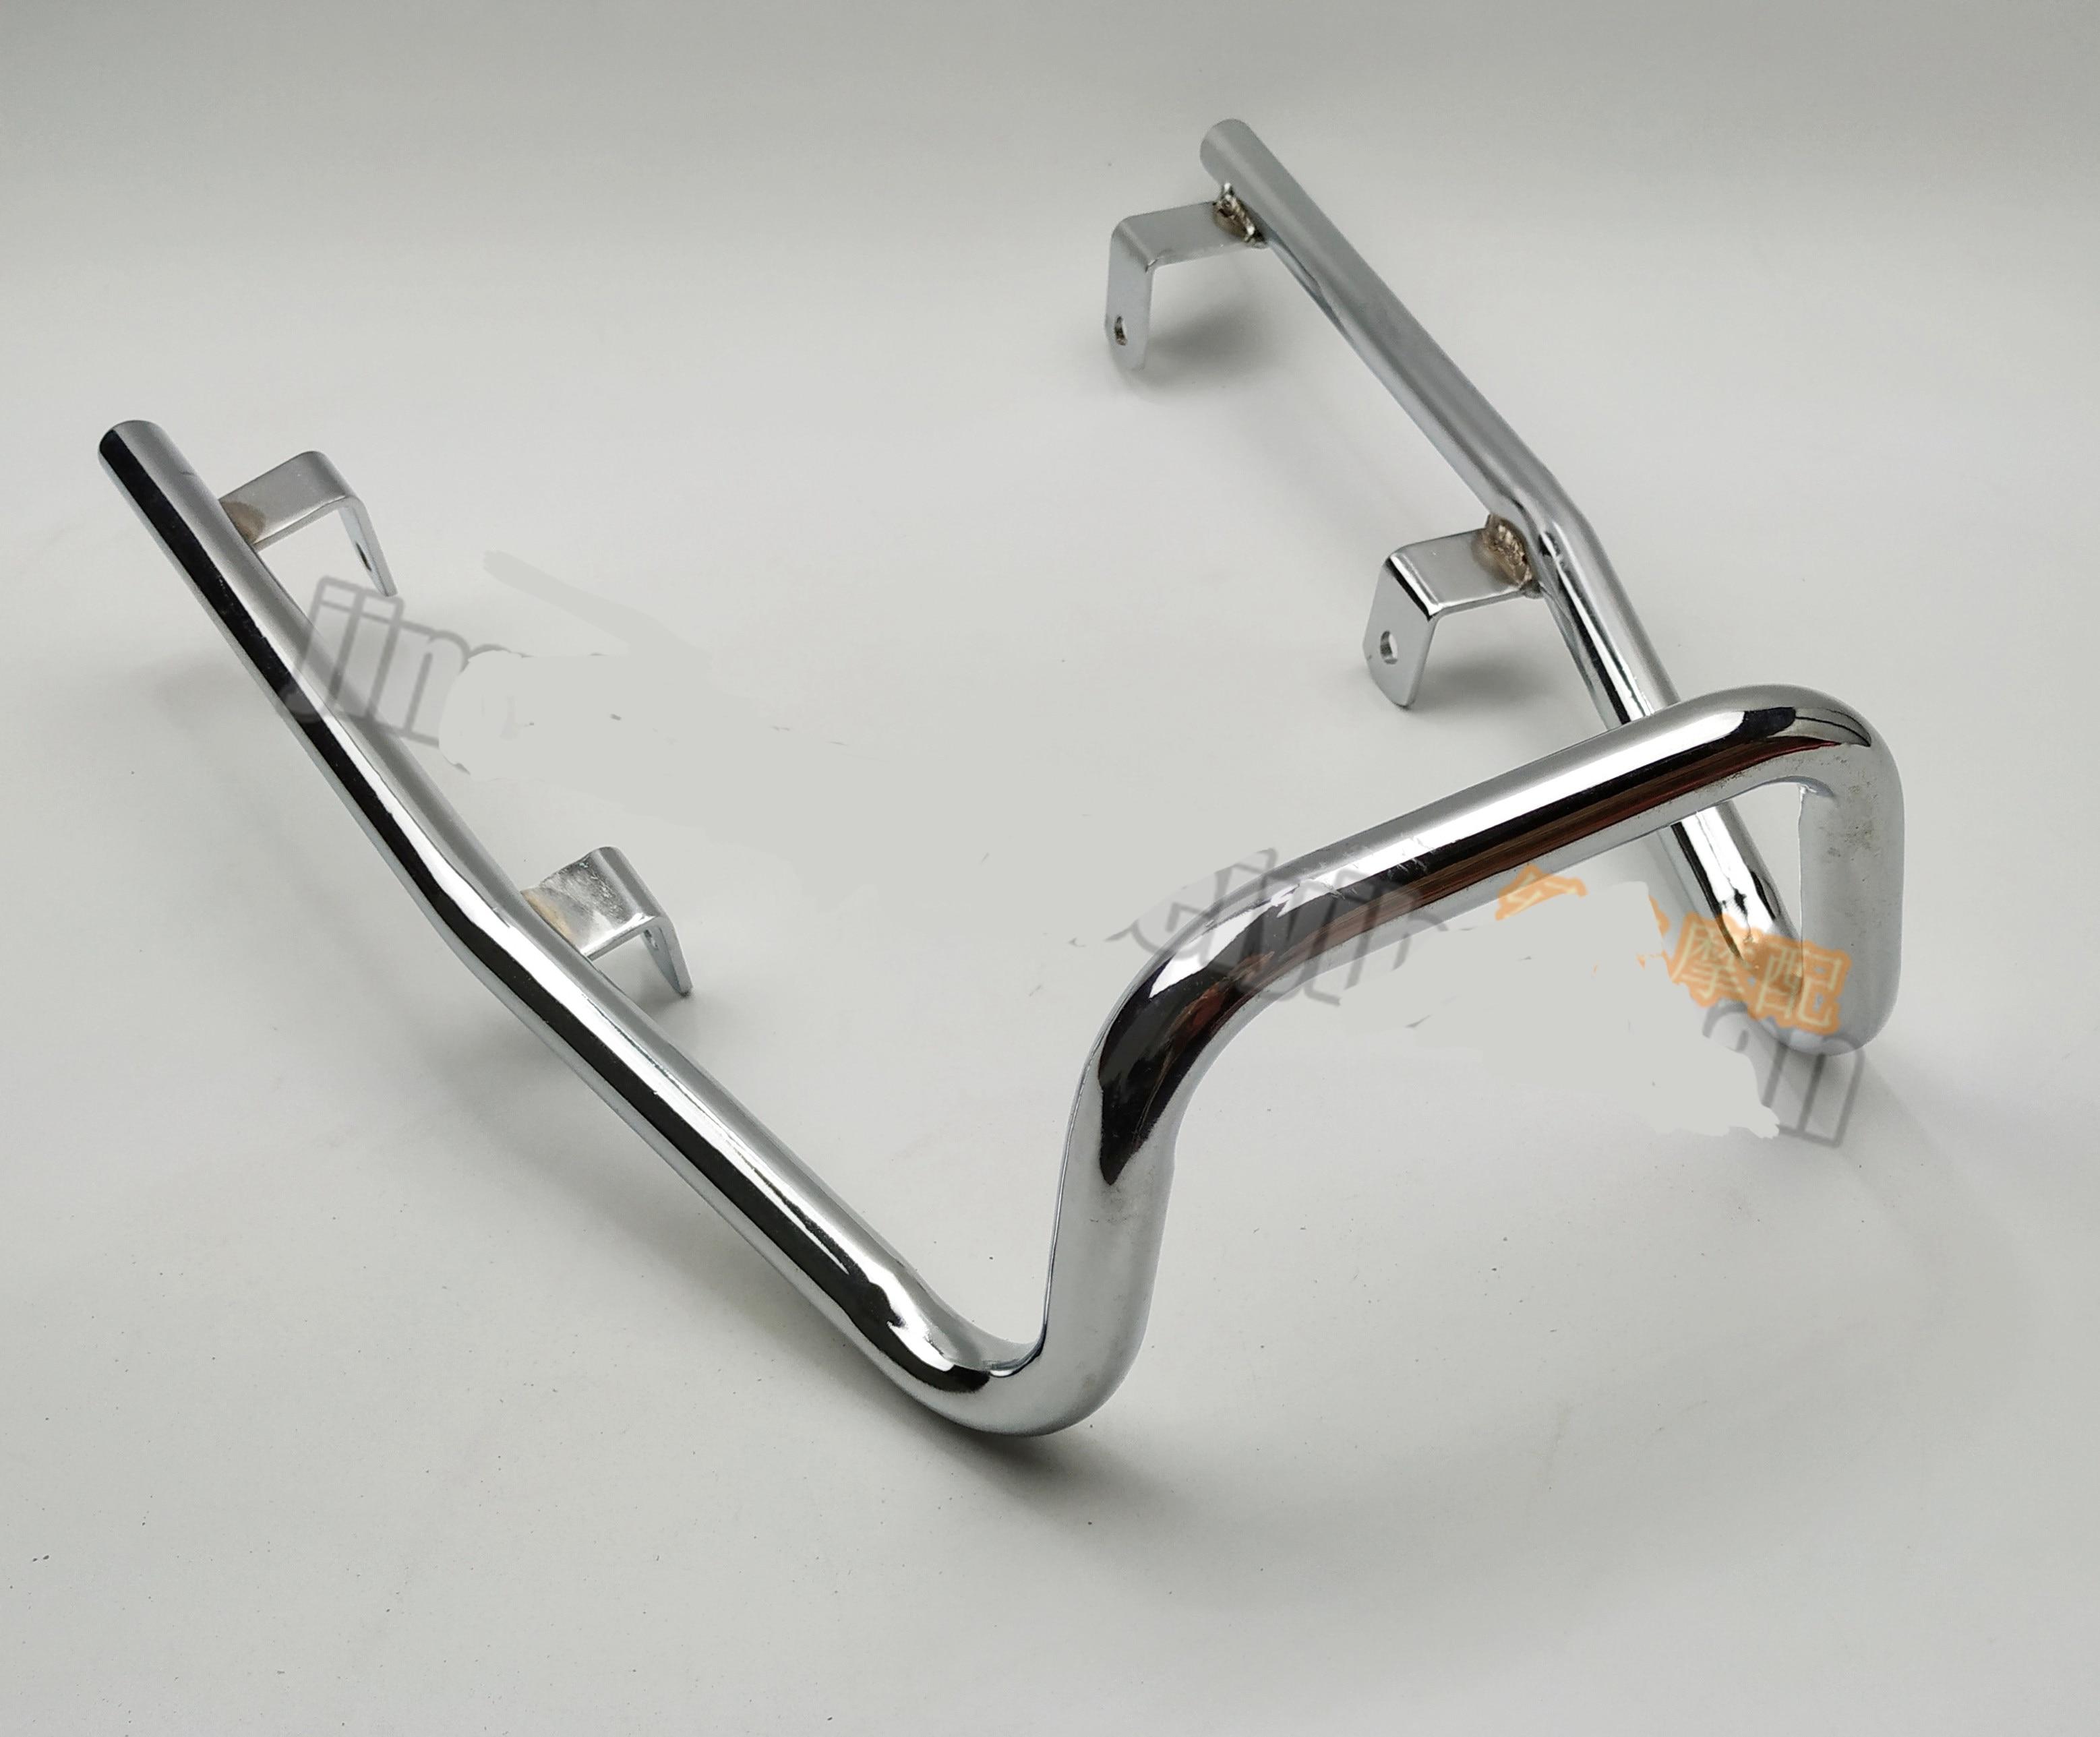 Chrome Plated Steel Durable Rear Tail Grab Handle Sissy Bar Fit For Honda CB400F 400 Four / CB1100 Chrome